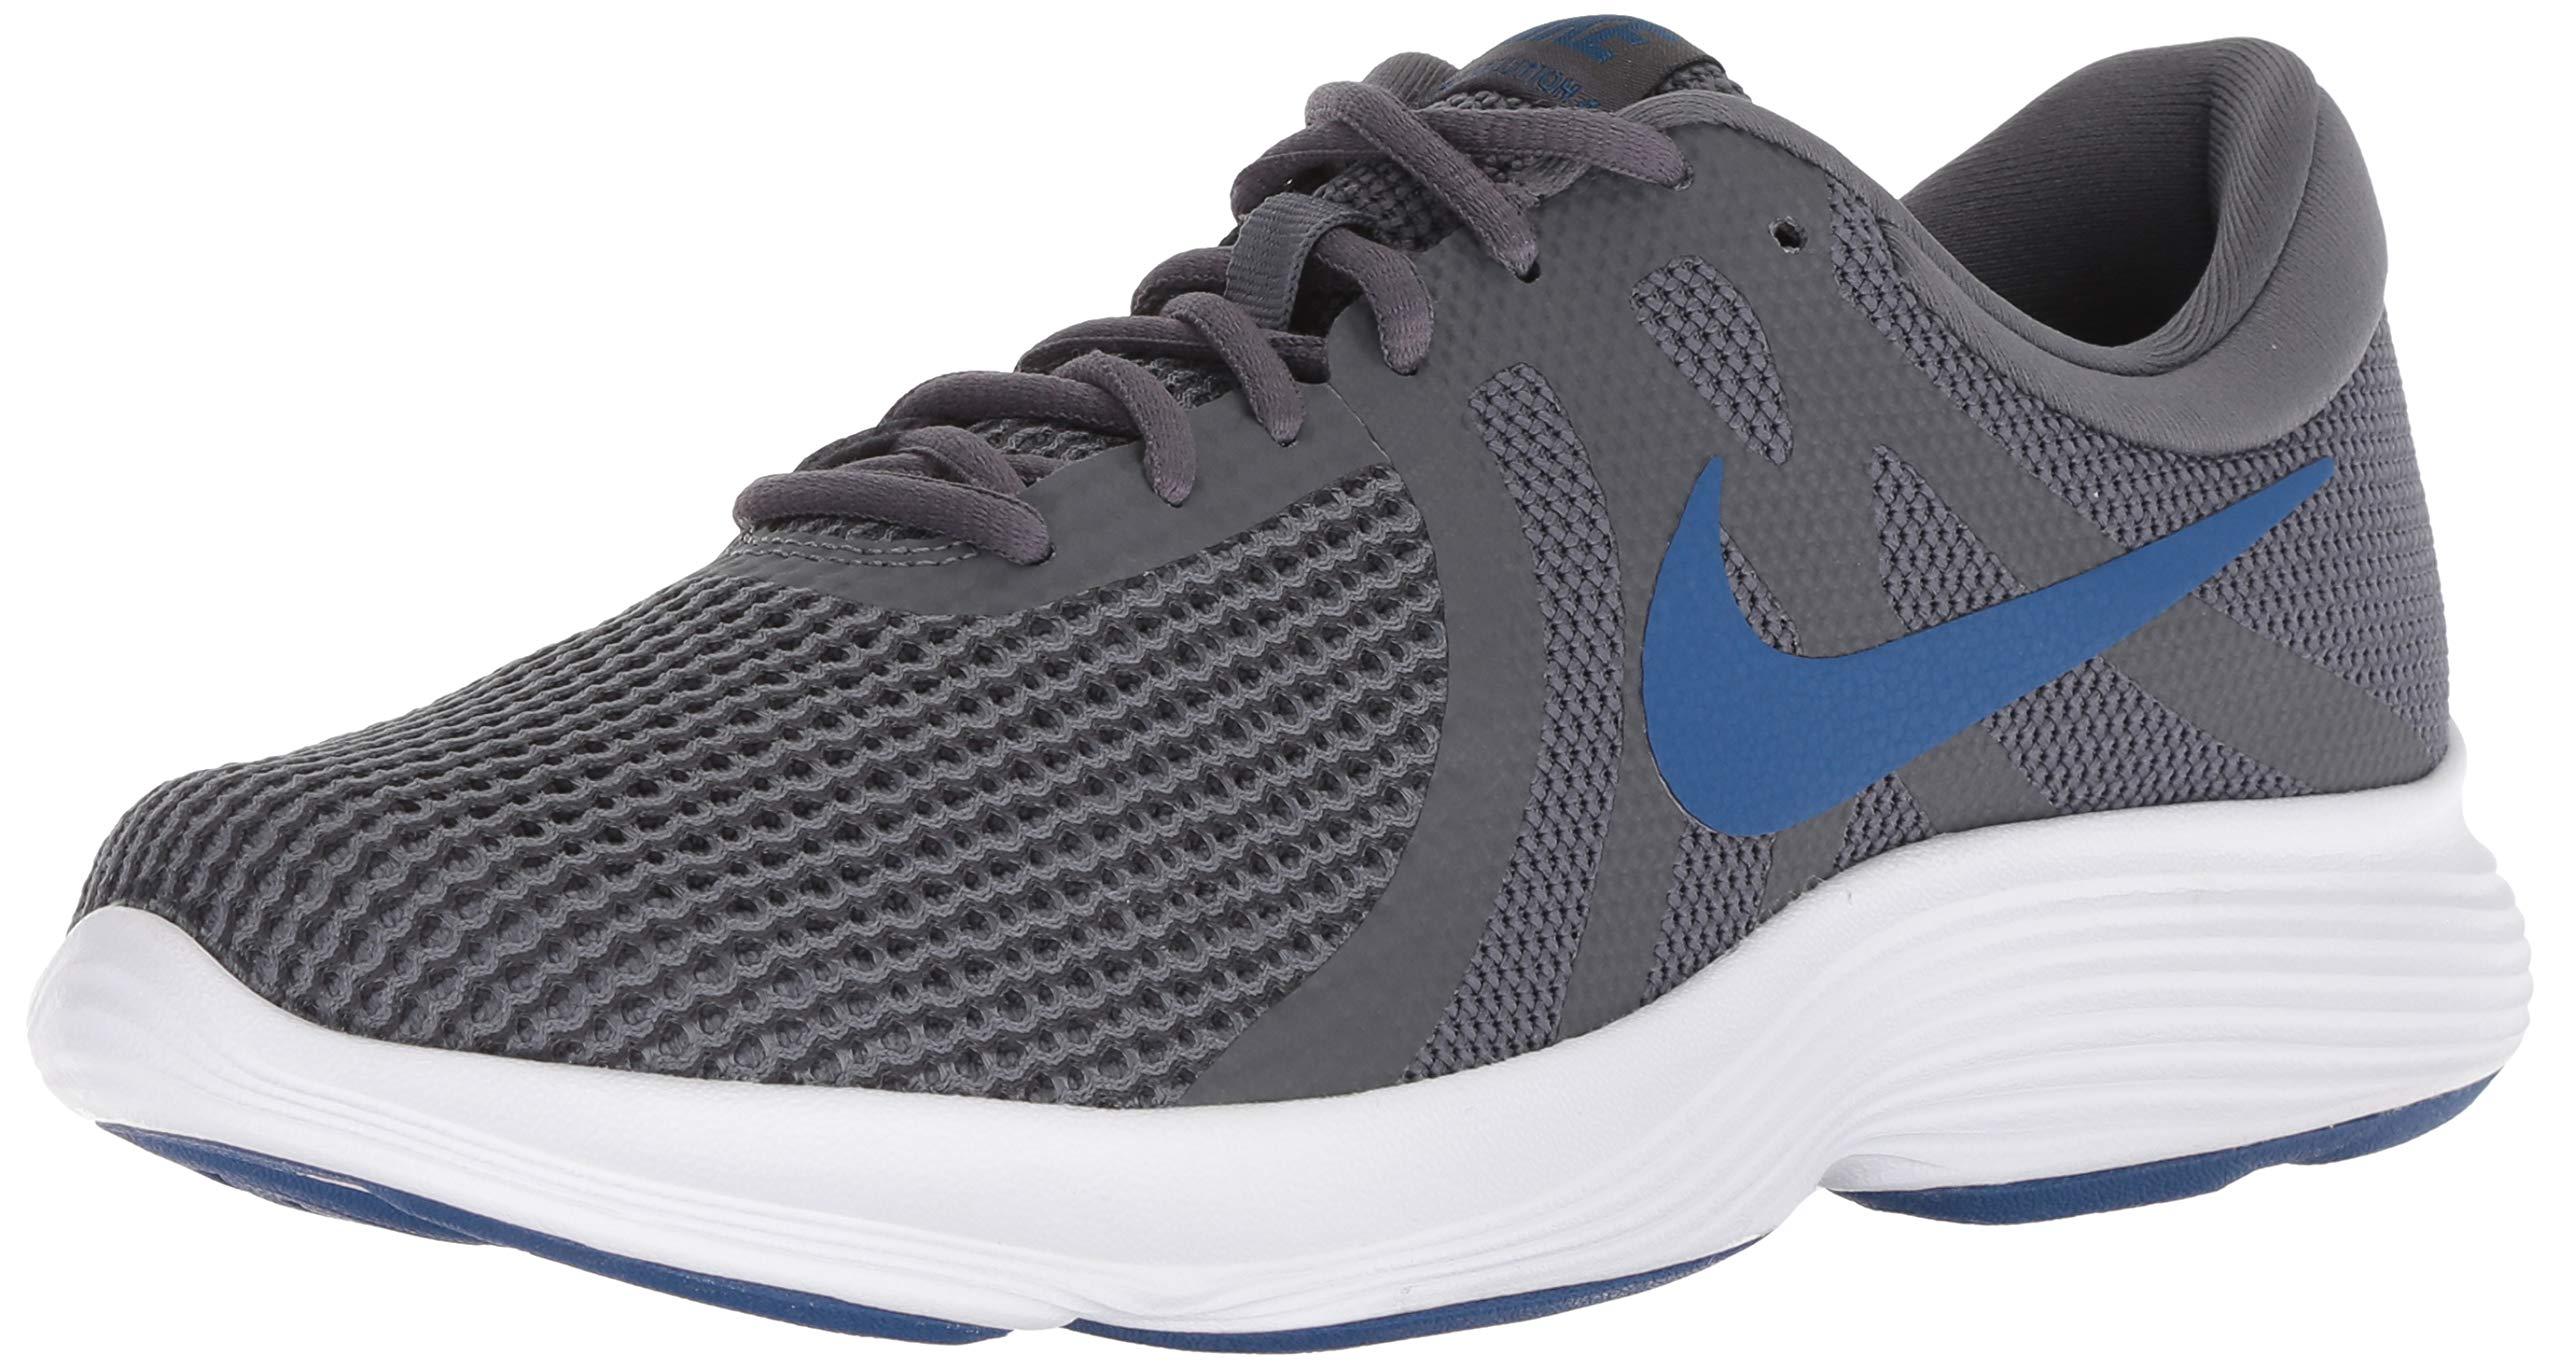 Nike Men's Revolution 4 Running Shoe, Dark Grey/Gym Blue - Anthracite, 14 Regular US by Nike